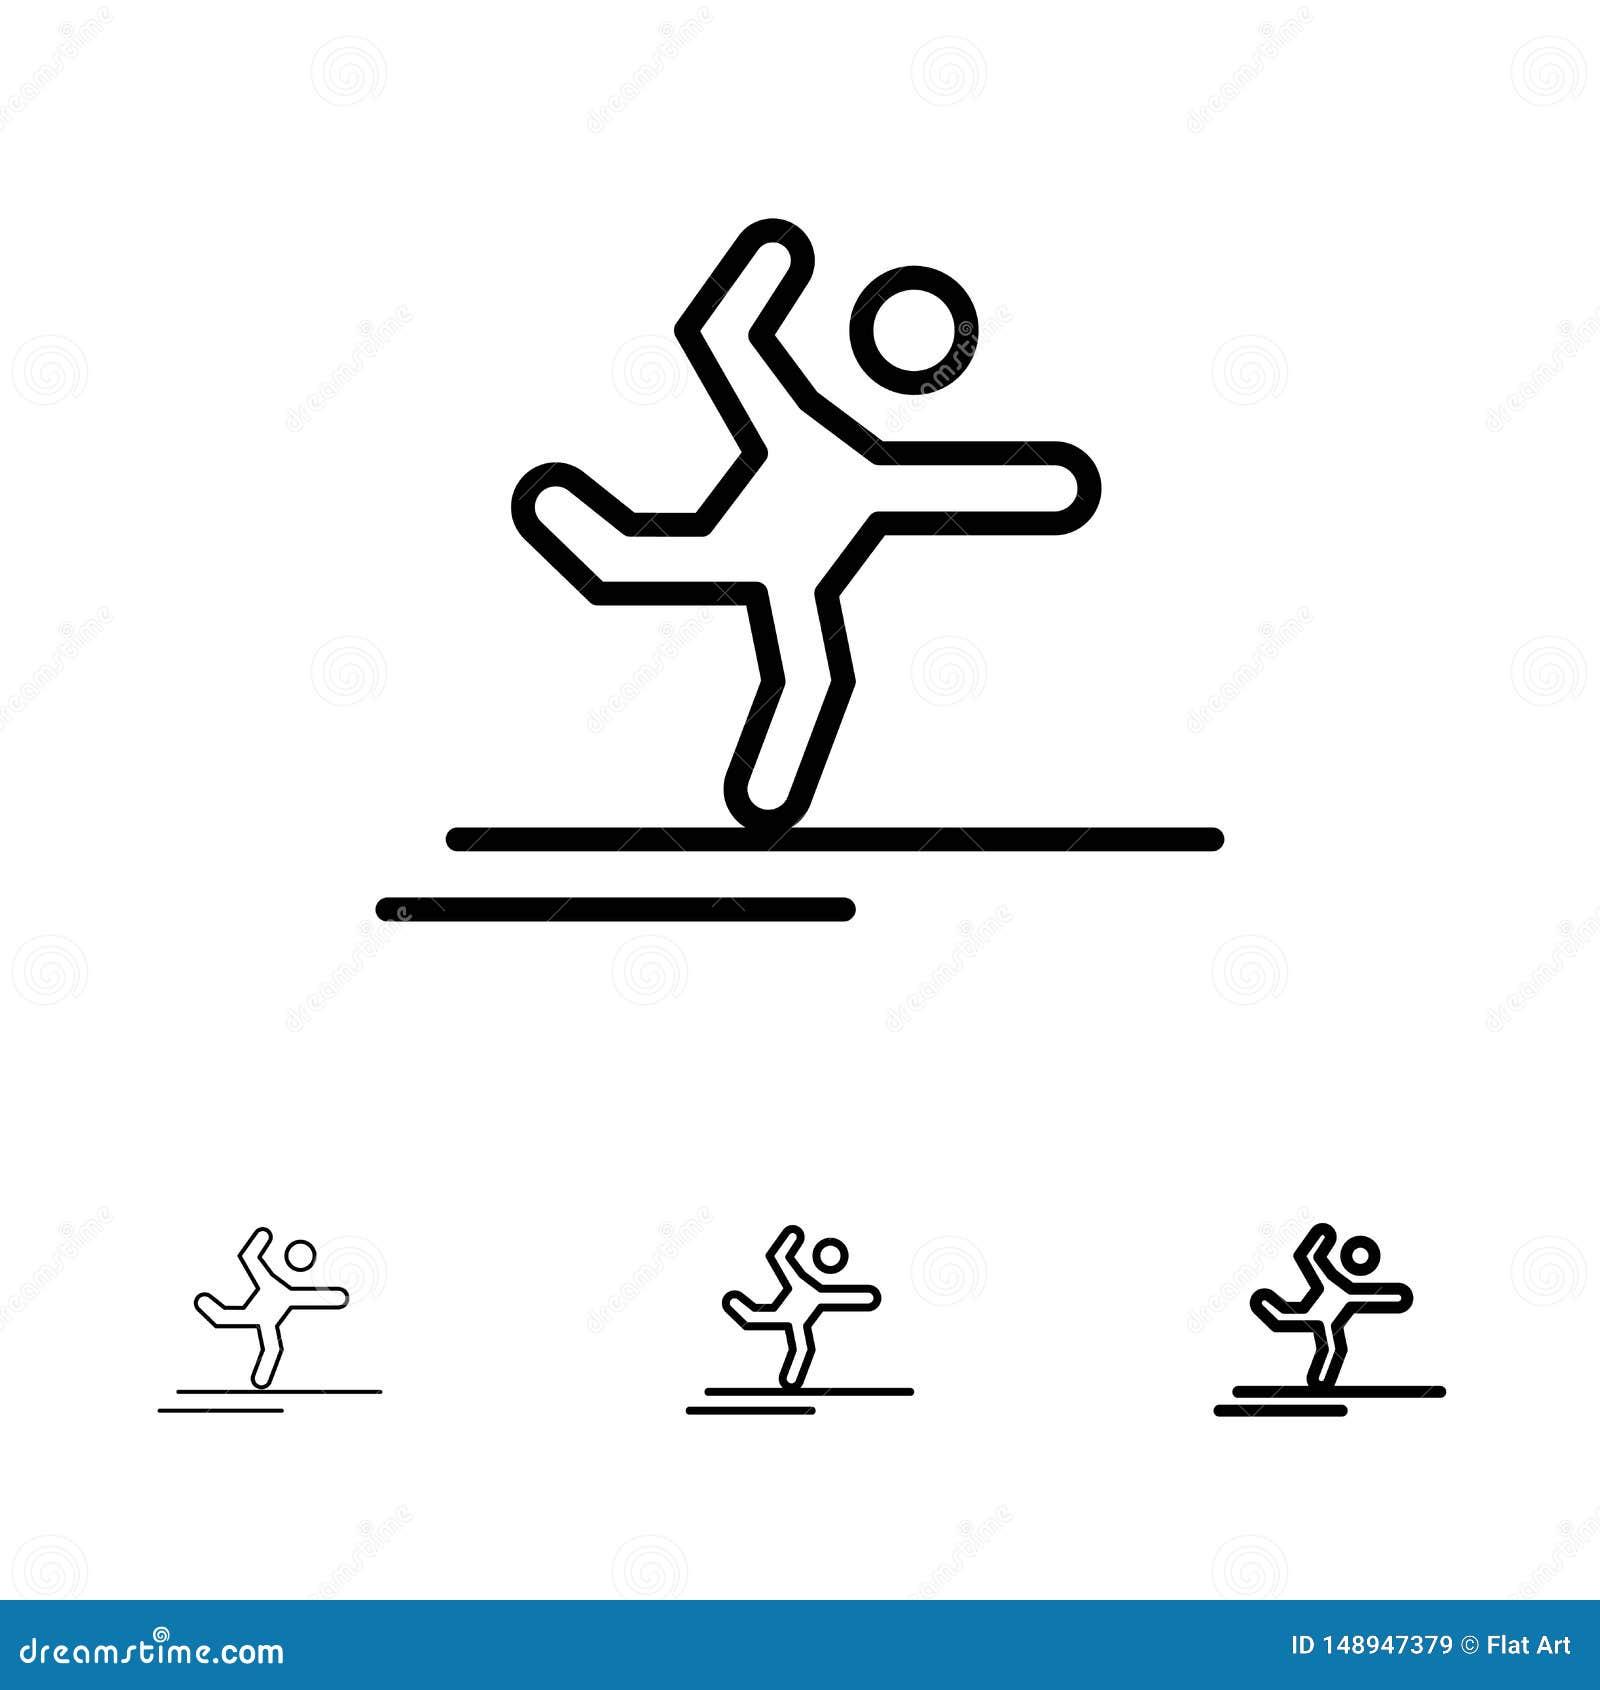 Athlete, Gymnastics, Performing, Stretching Bold and thin black line icon set